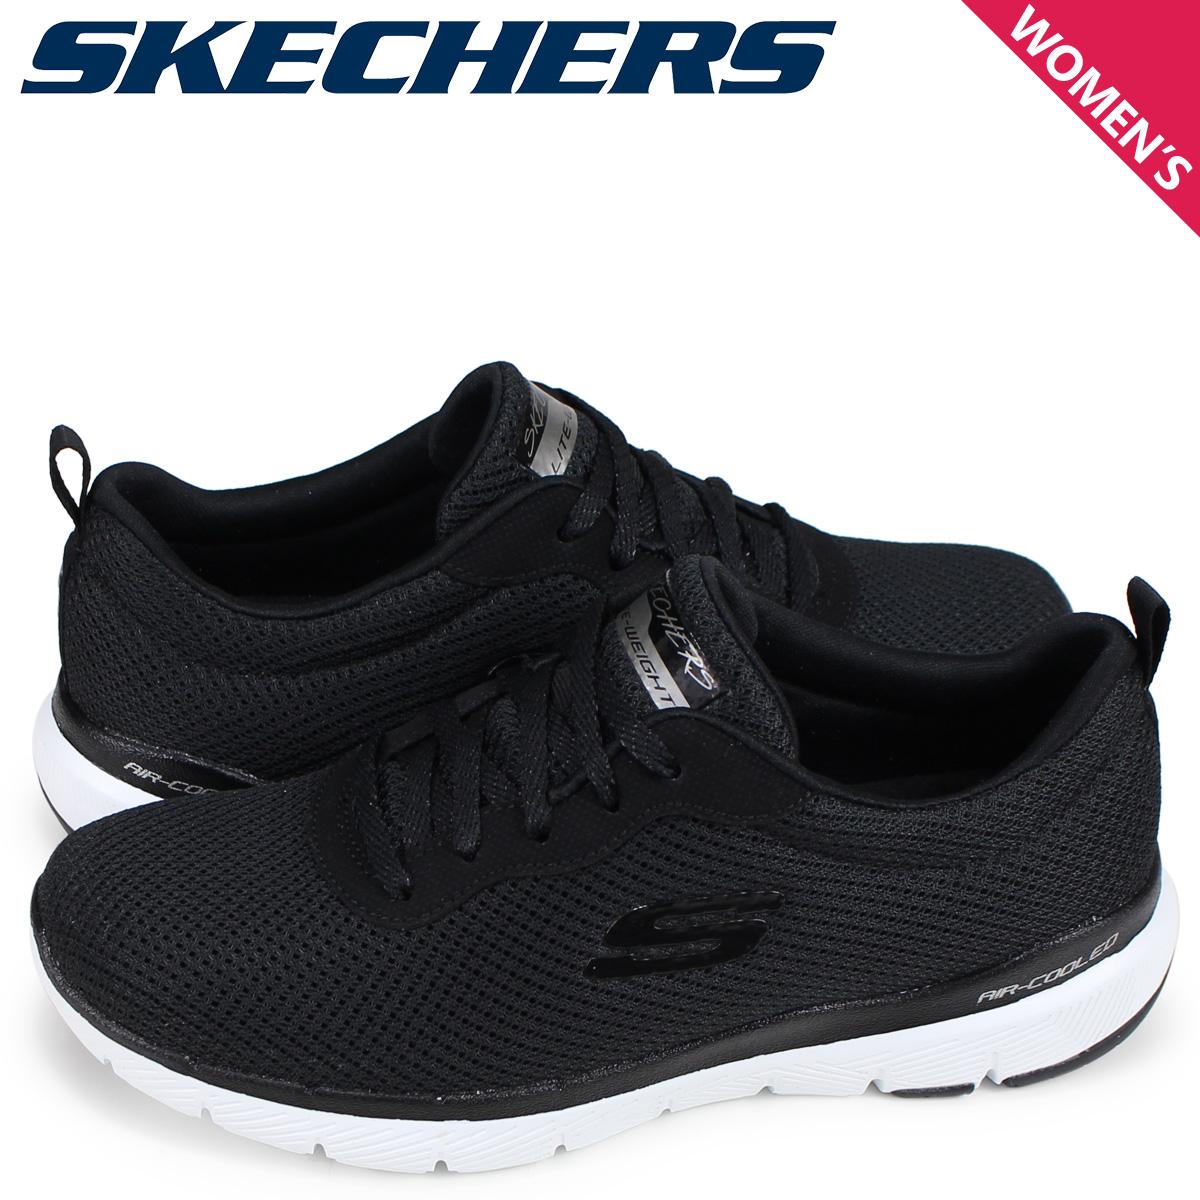 Skechers Womens Flex Appeal 3.0 First Insight Black